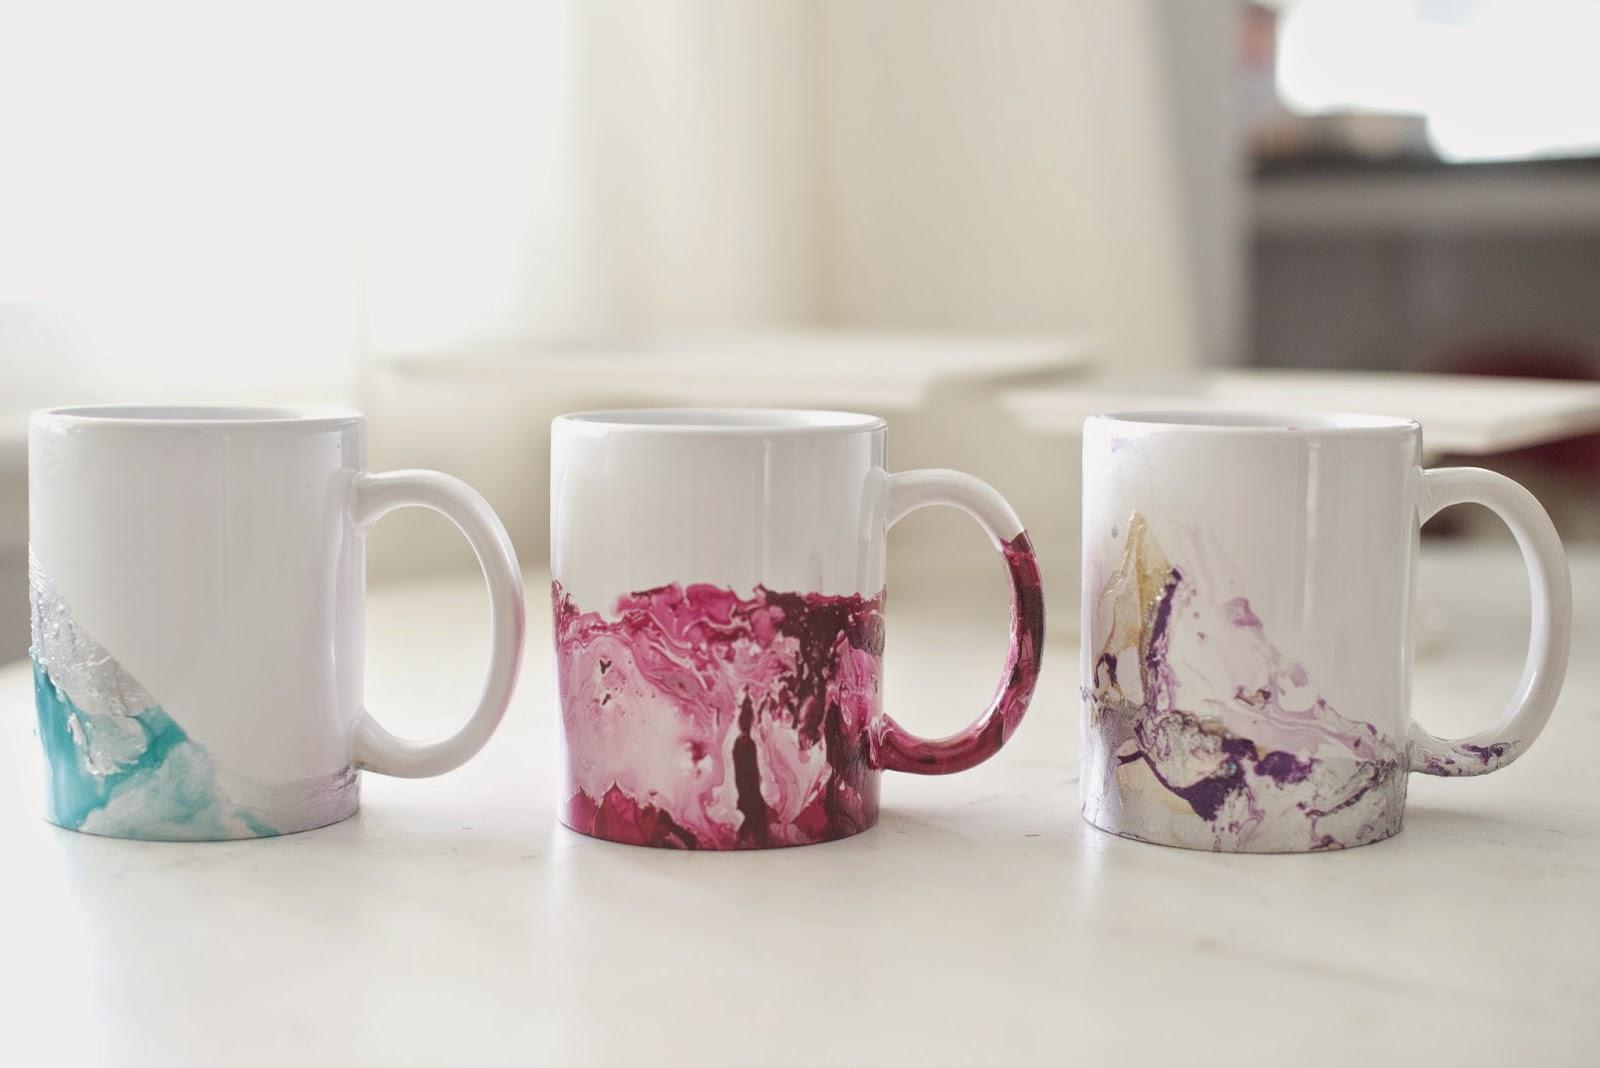 How To Paint A Coffee Mug With Acrylic Paint